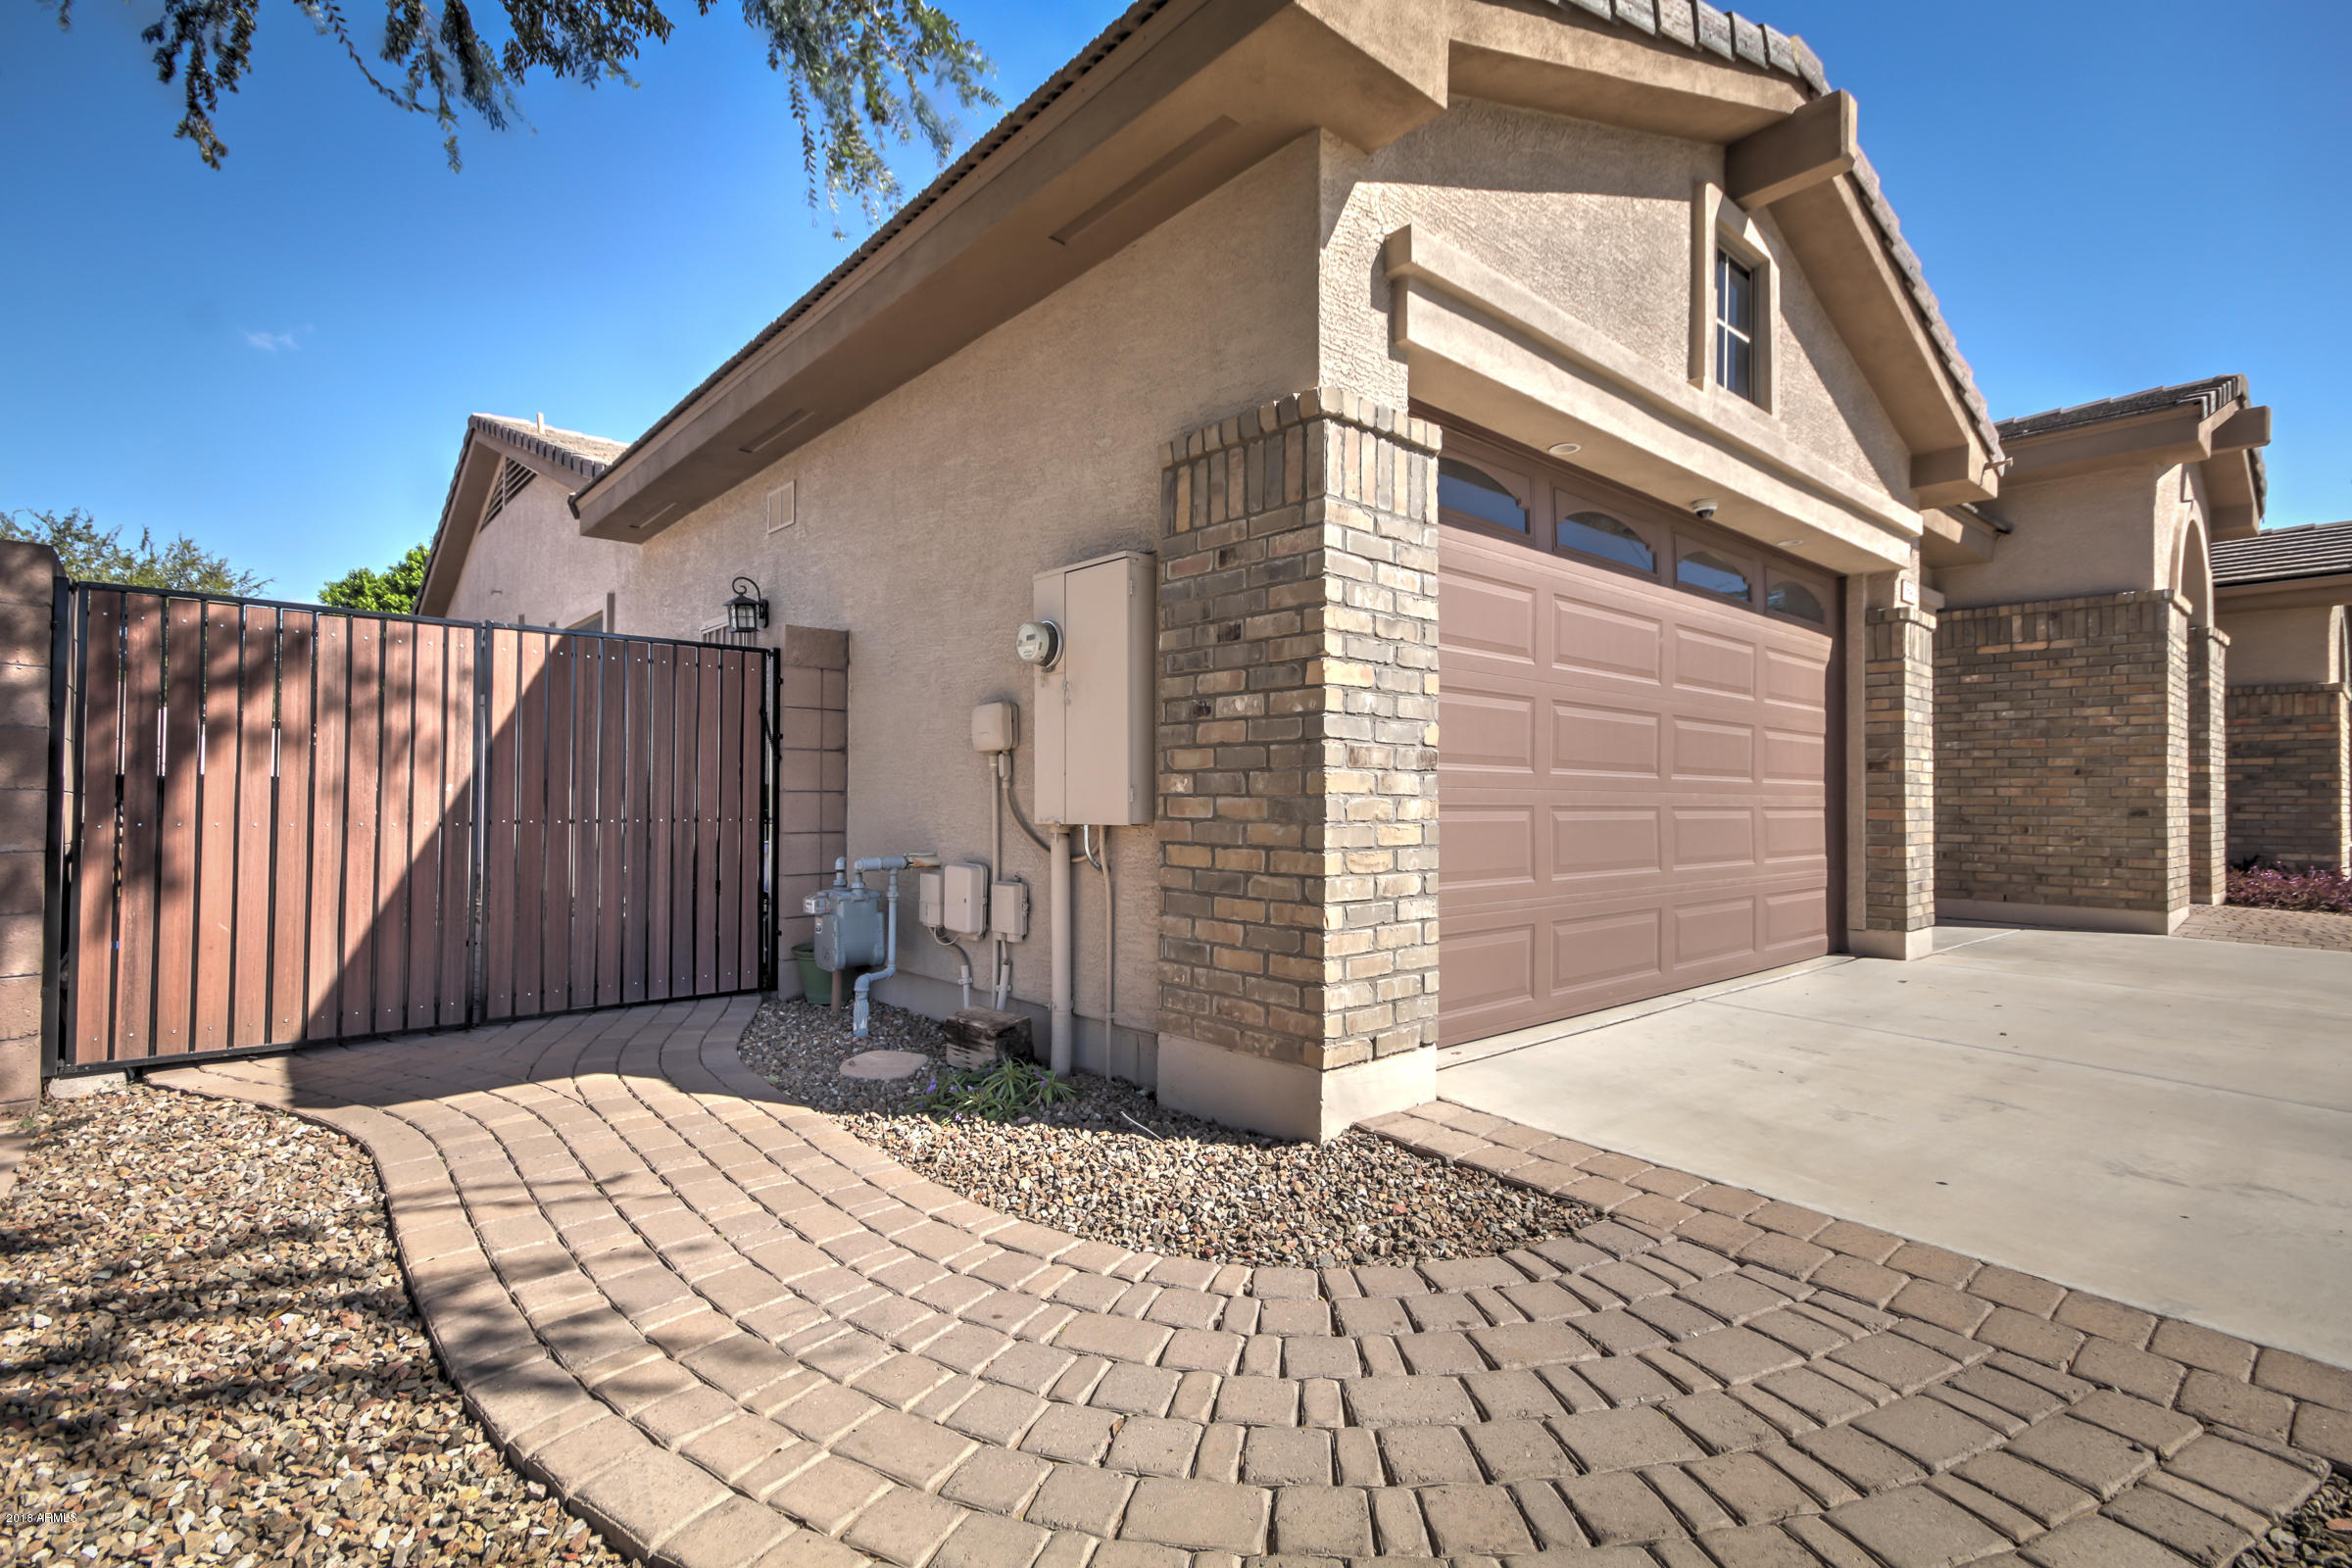 MLS 5829876 554 E JOSEPH Way, Gilbert, AZ 85295 Gilbert AZ Vintage Ranch